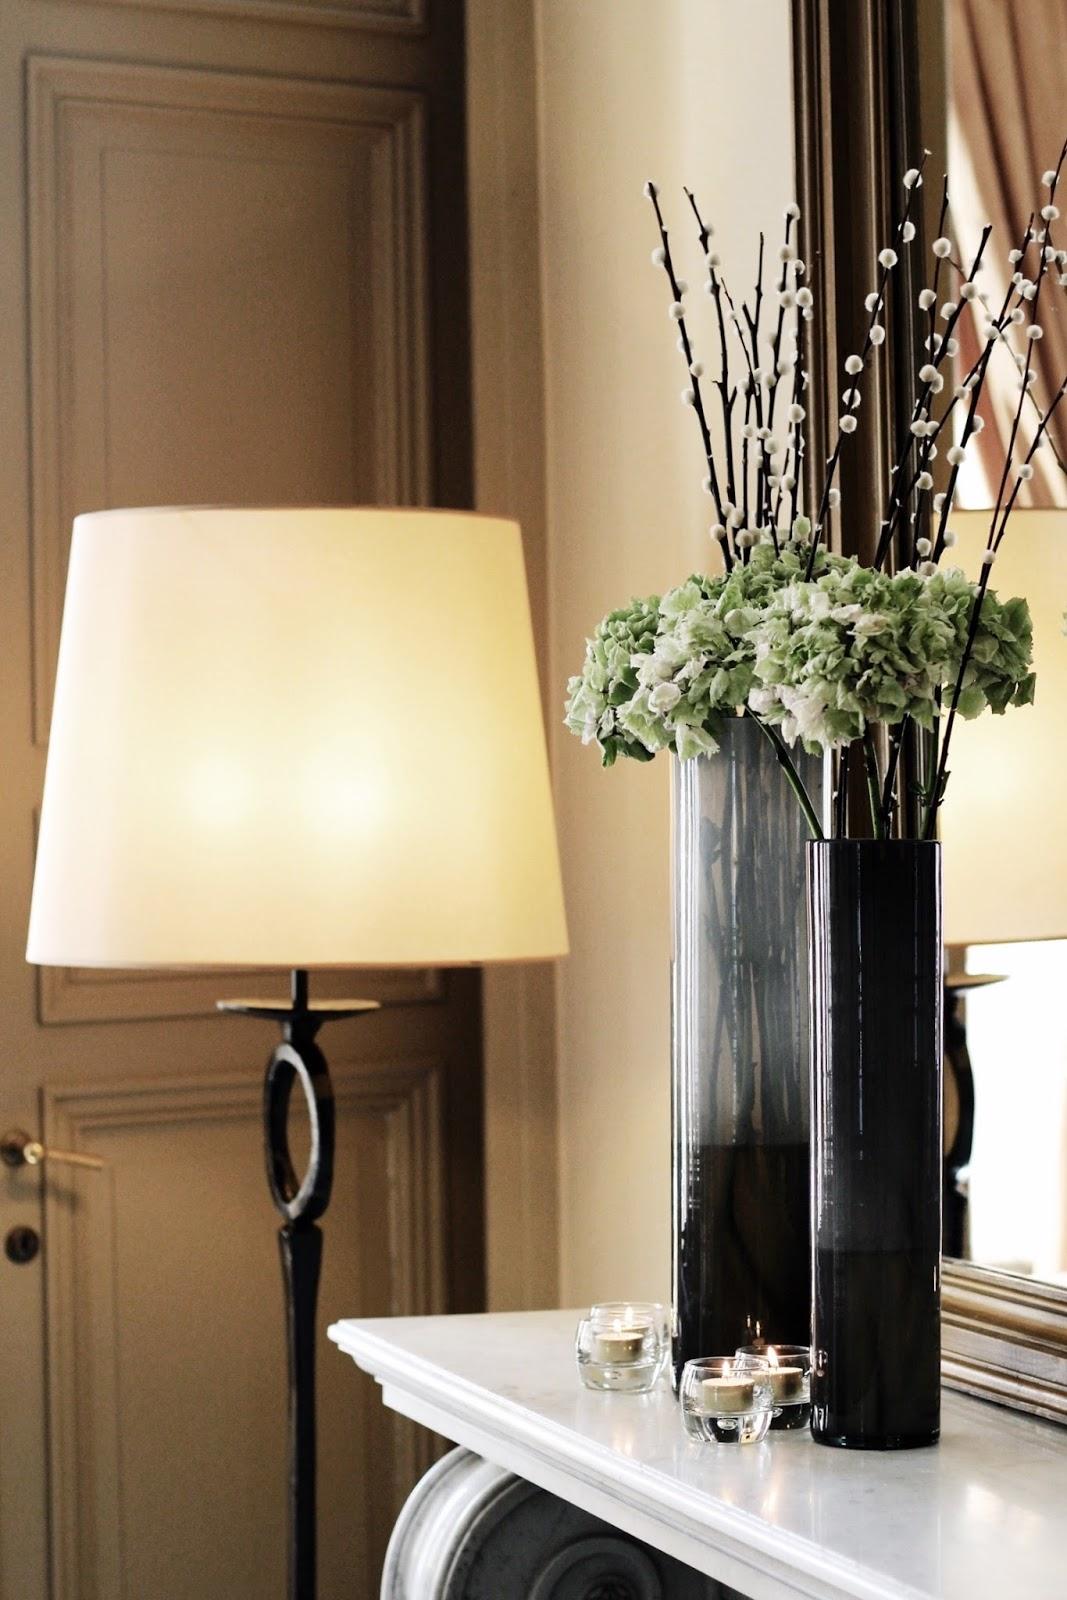 Hotel Dukes' Palace Flower Displays Decor